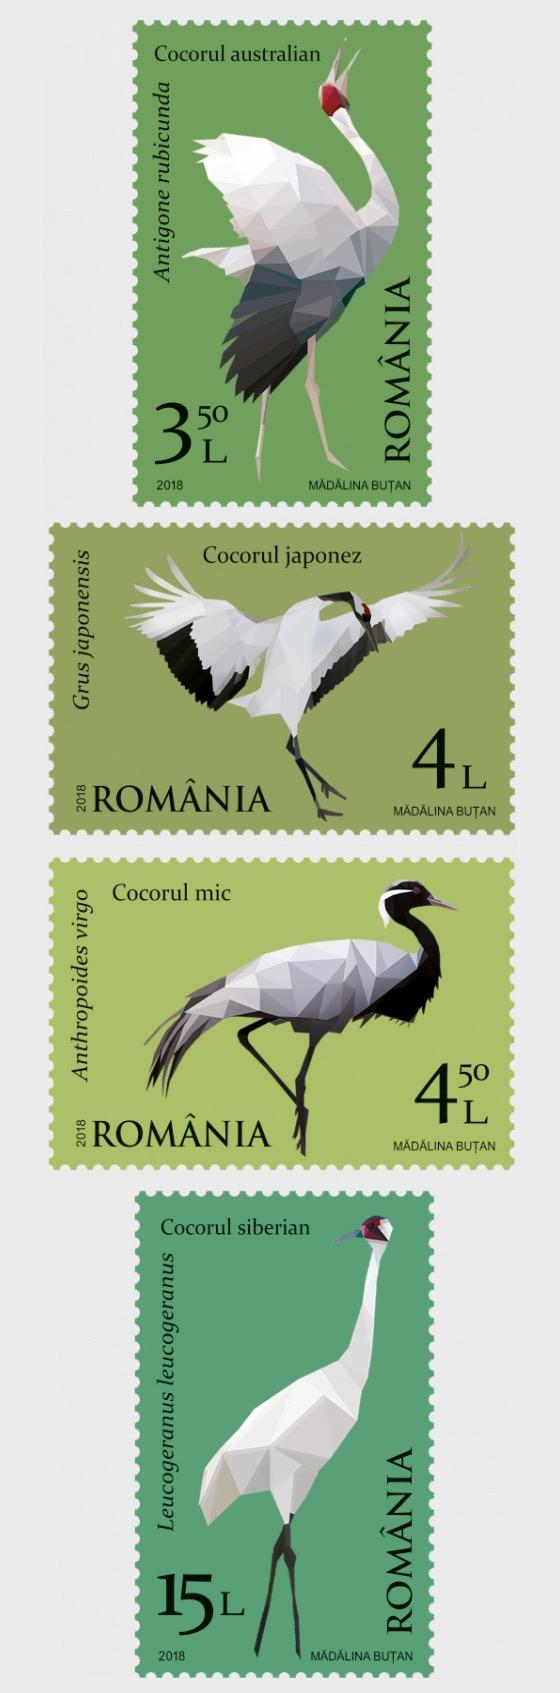 Migratory Birds - Cranes - Set